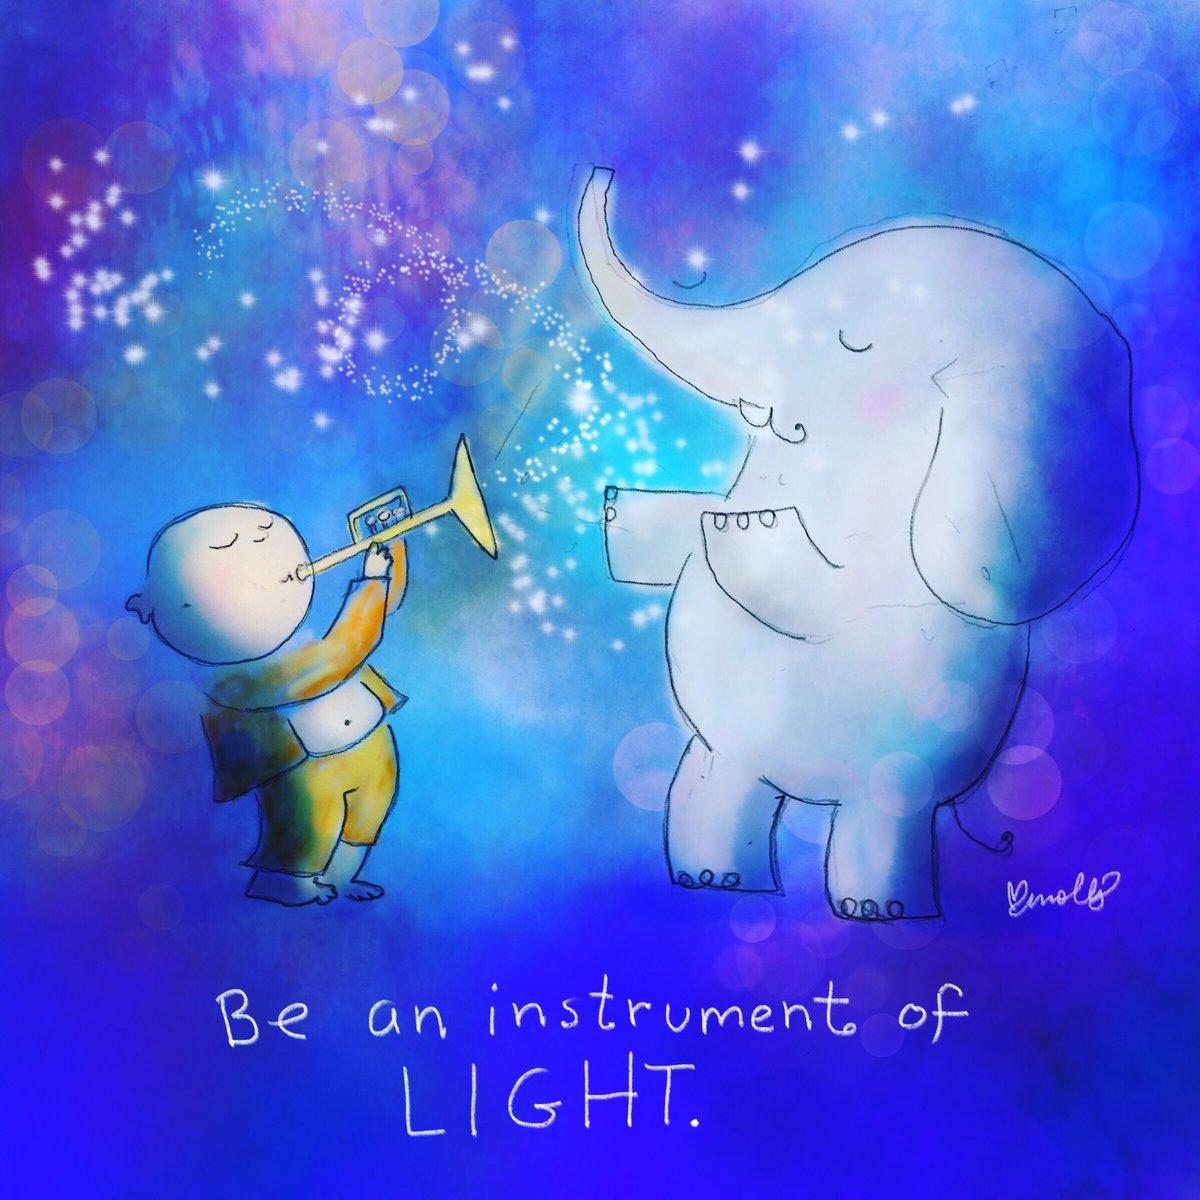 Be an instrument of #Love & #Light! #JoyTrain #Joy #Kindness #BeLove #BeKind #MentalHealth #Mindfulness #GoldenHearts #IAM #StarFishClub #FamilyTrain #kjoys00 #TuesdayMorning #TuesdayThoughts #TuesdayMotivation RT @BuddhaDoodles @SnowCalmth